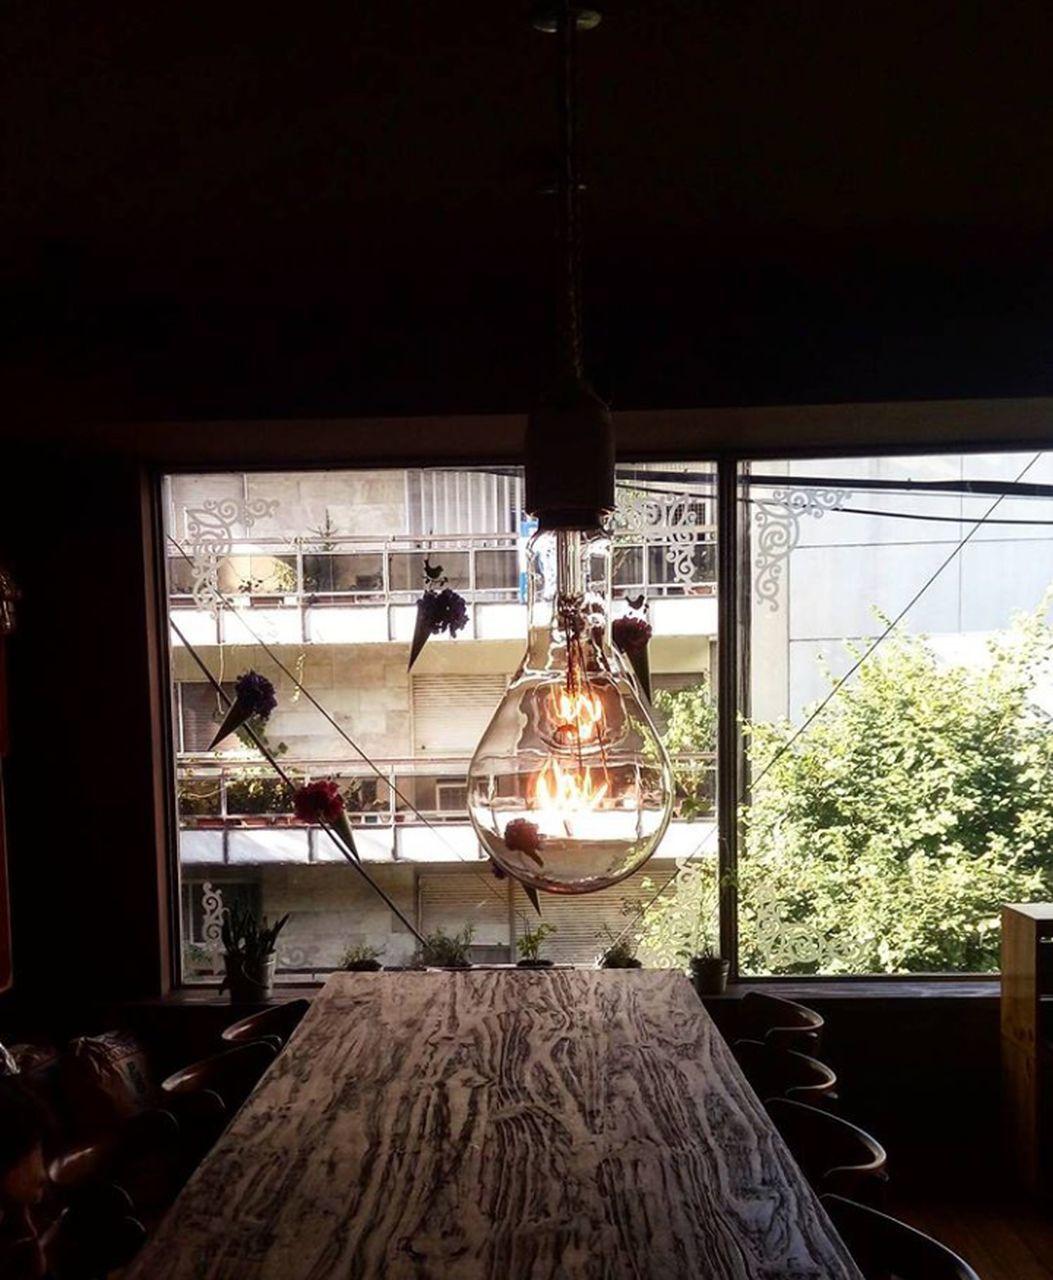 hanging, window, indoors, lighting equipment, no people, illuminated, day, nature